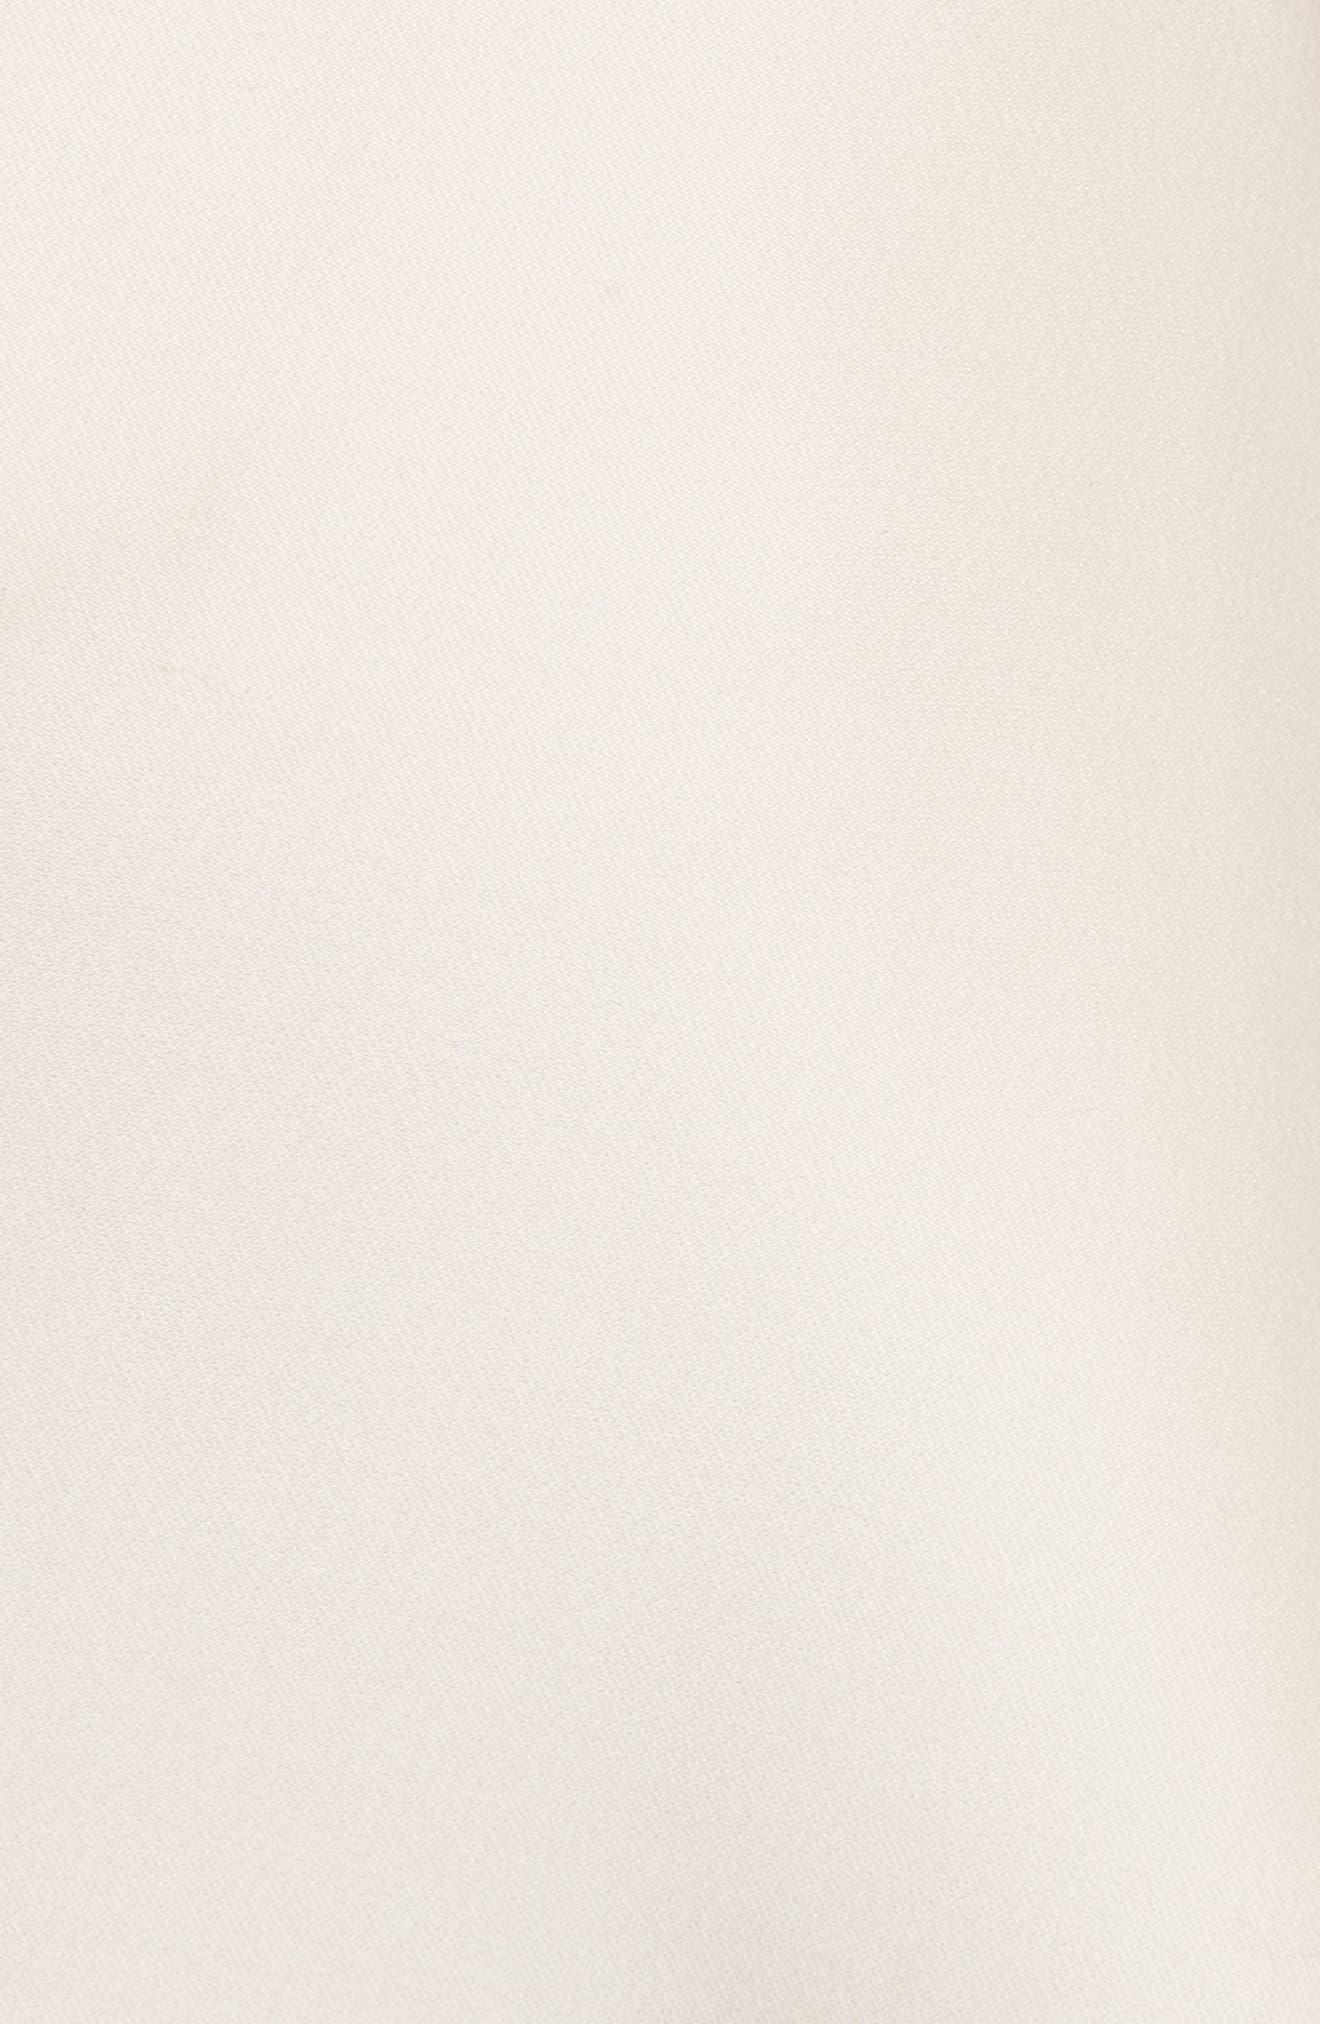 Duncan Strapless High/Low Peplum Top,                             Alternate thumbnail 5, color,                             282